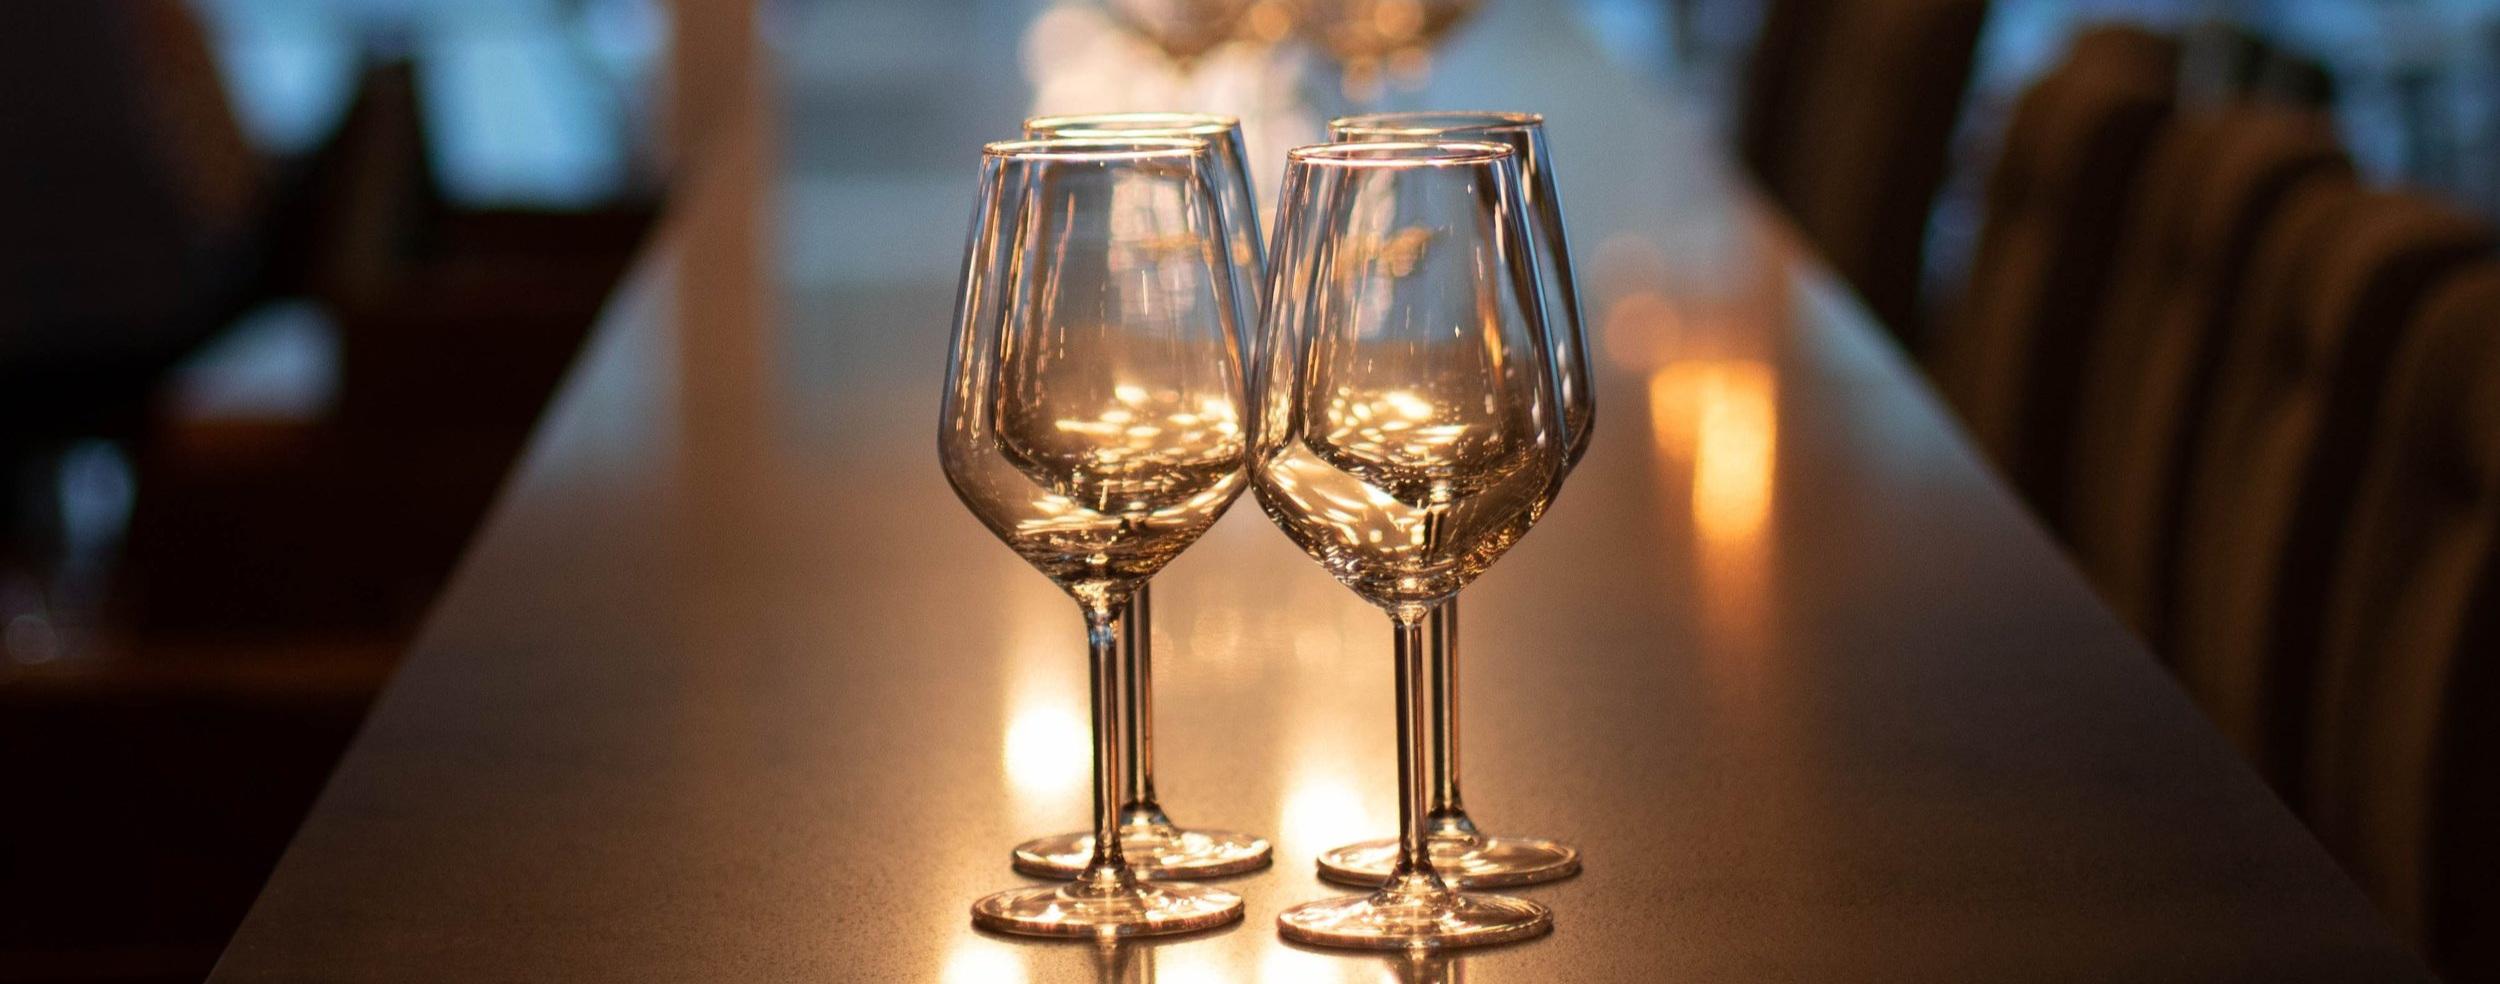 wine+bar-bulbs-1123259+%282%29.jpg